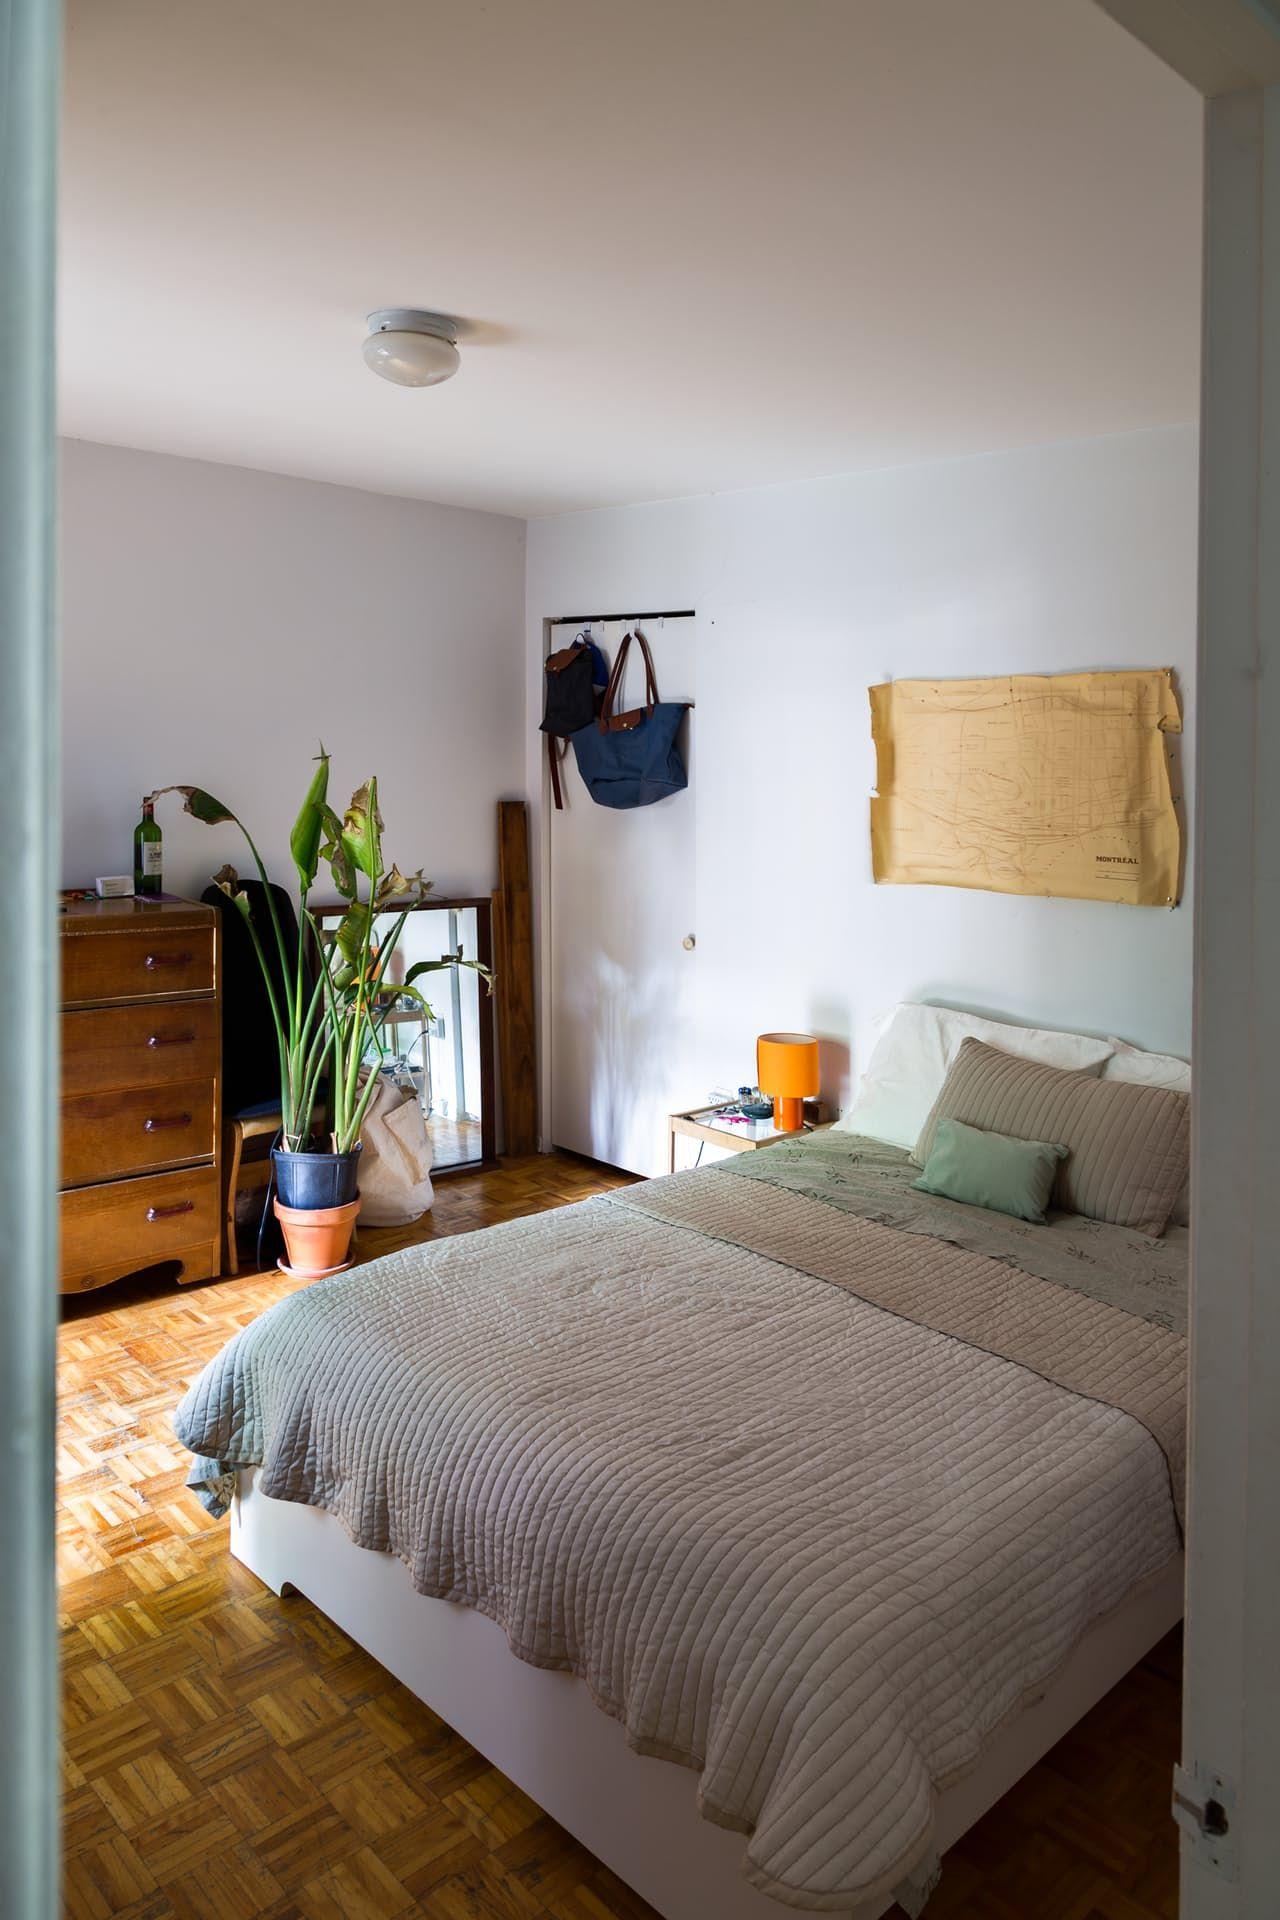 A Quiet, Quirky Gem of an Apartment in Montréal's Mile End ...